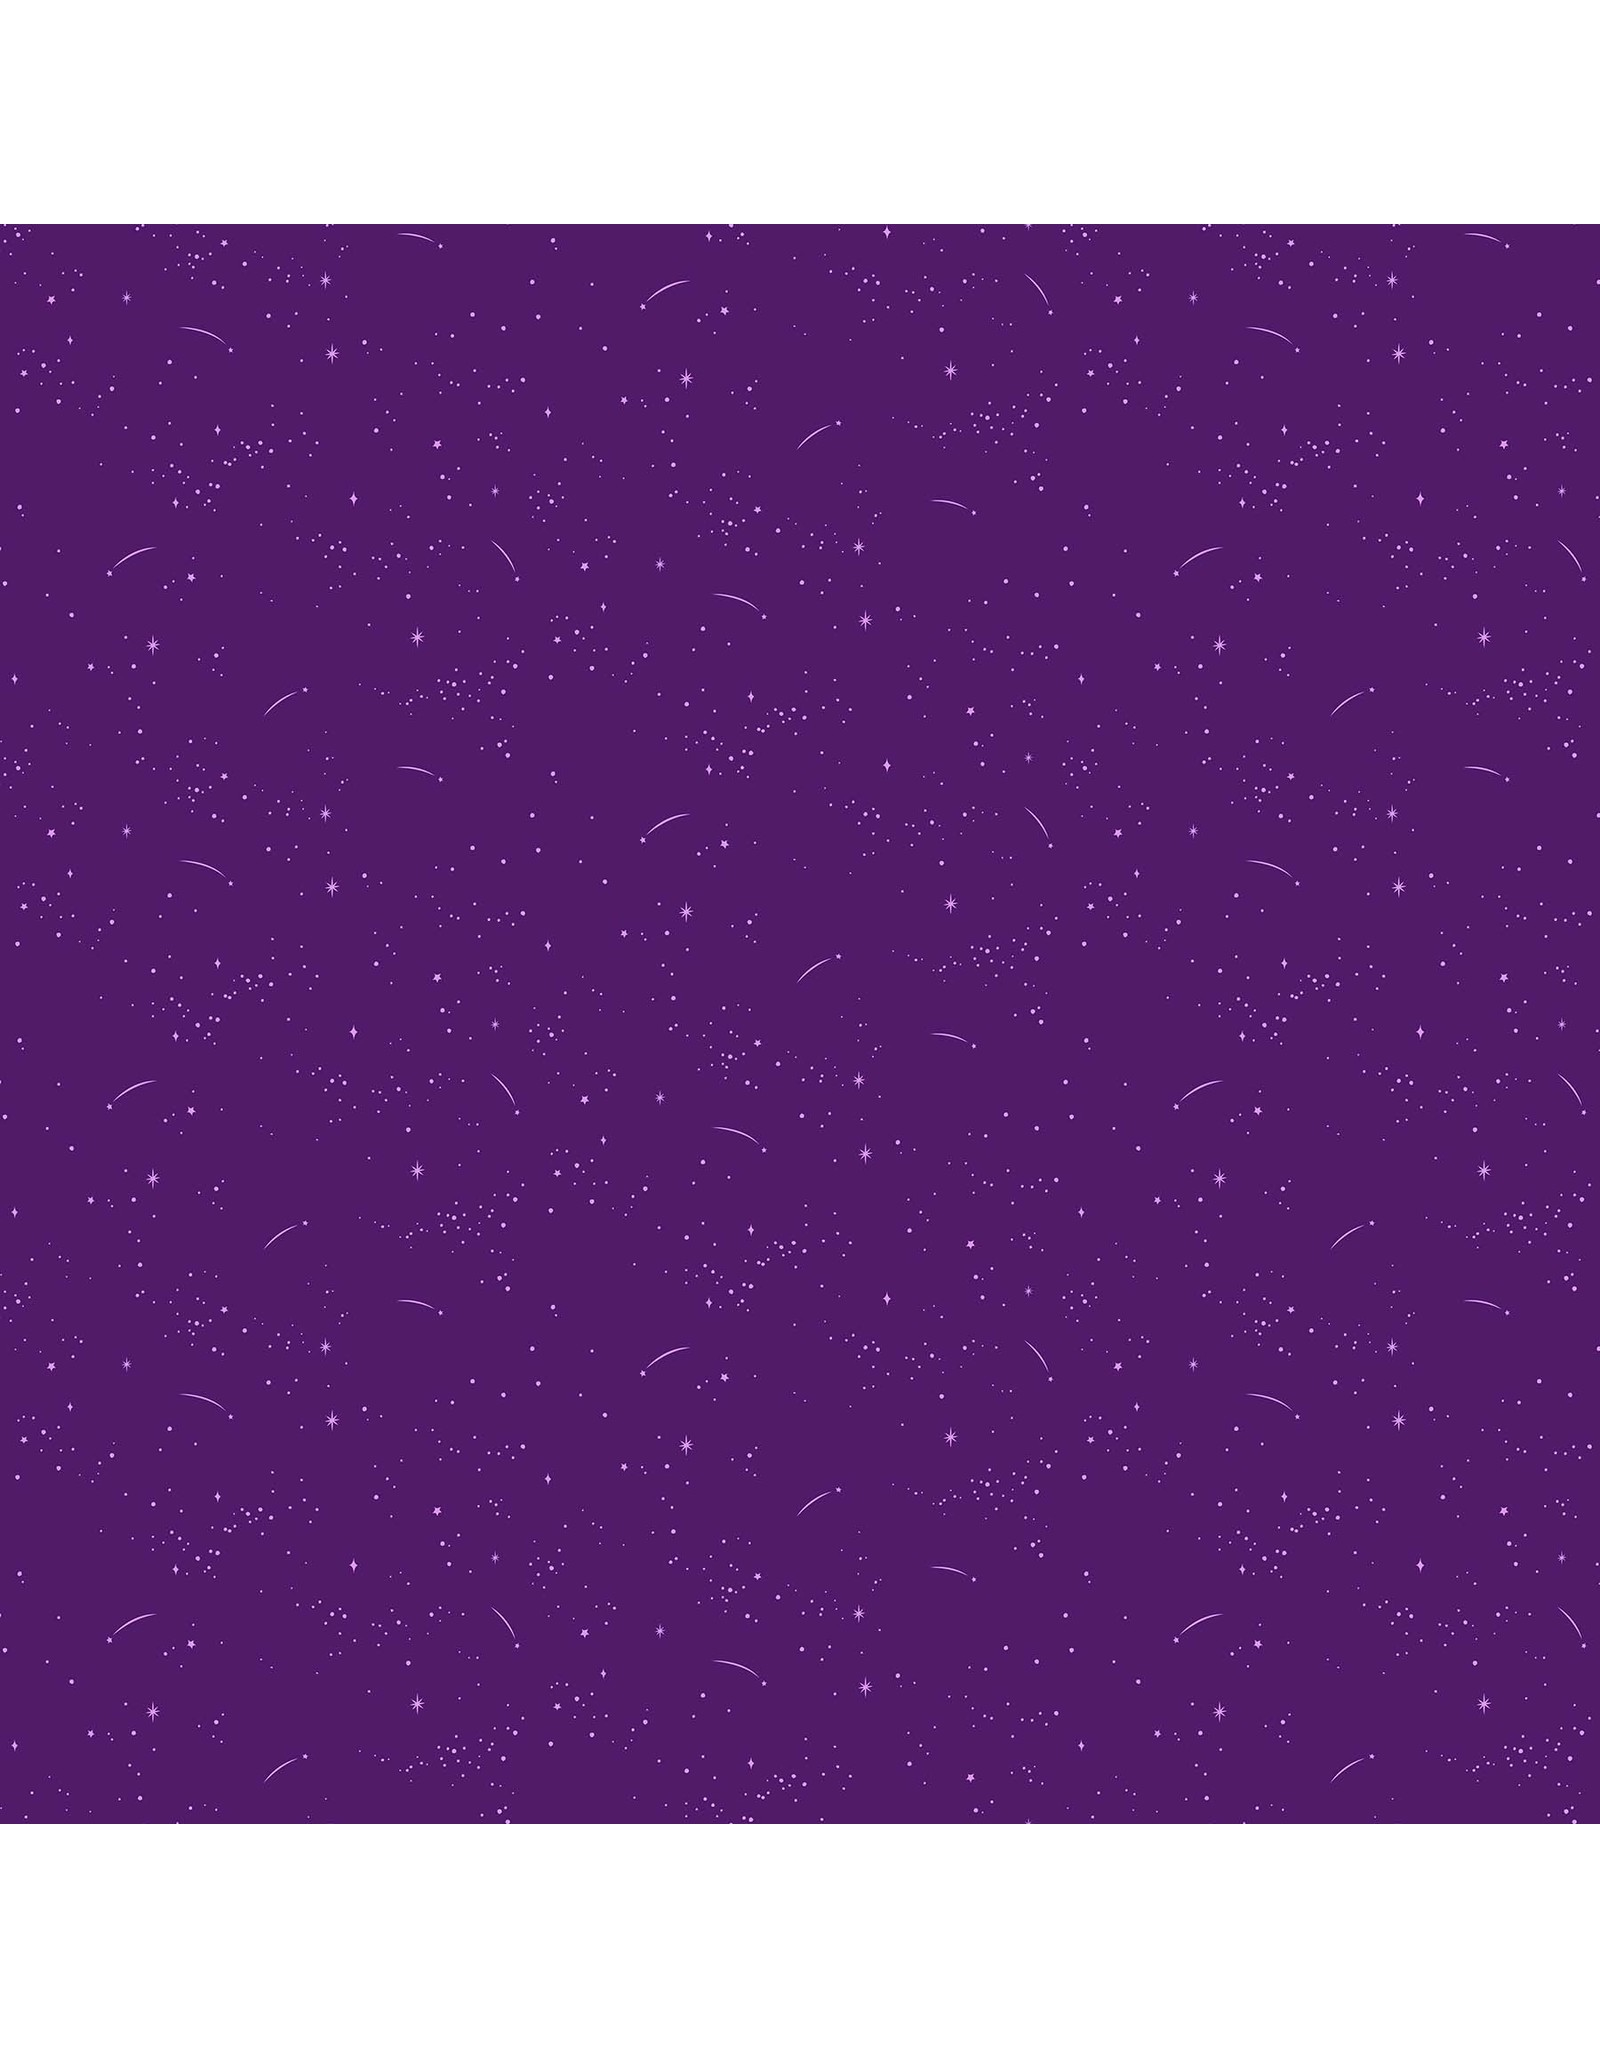 Figo Lucky Charms - Shooting Star Purple